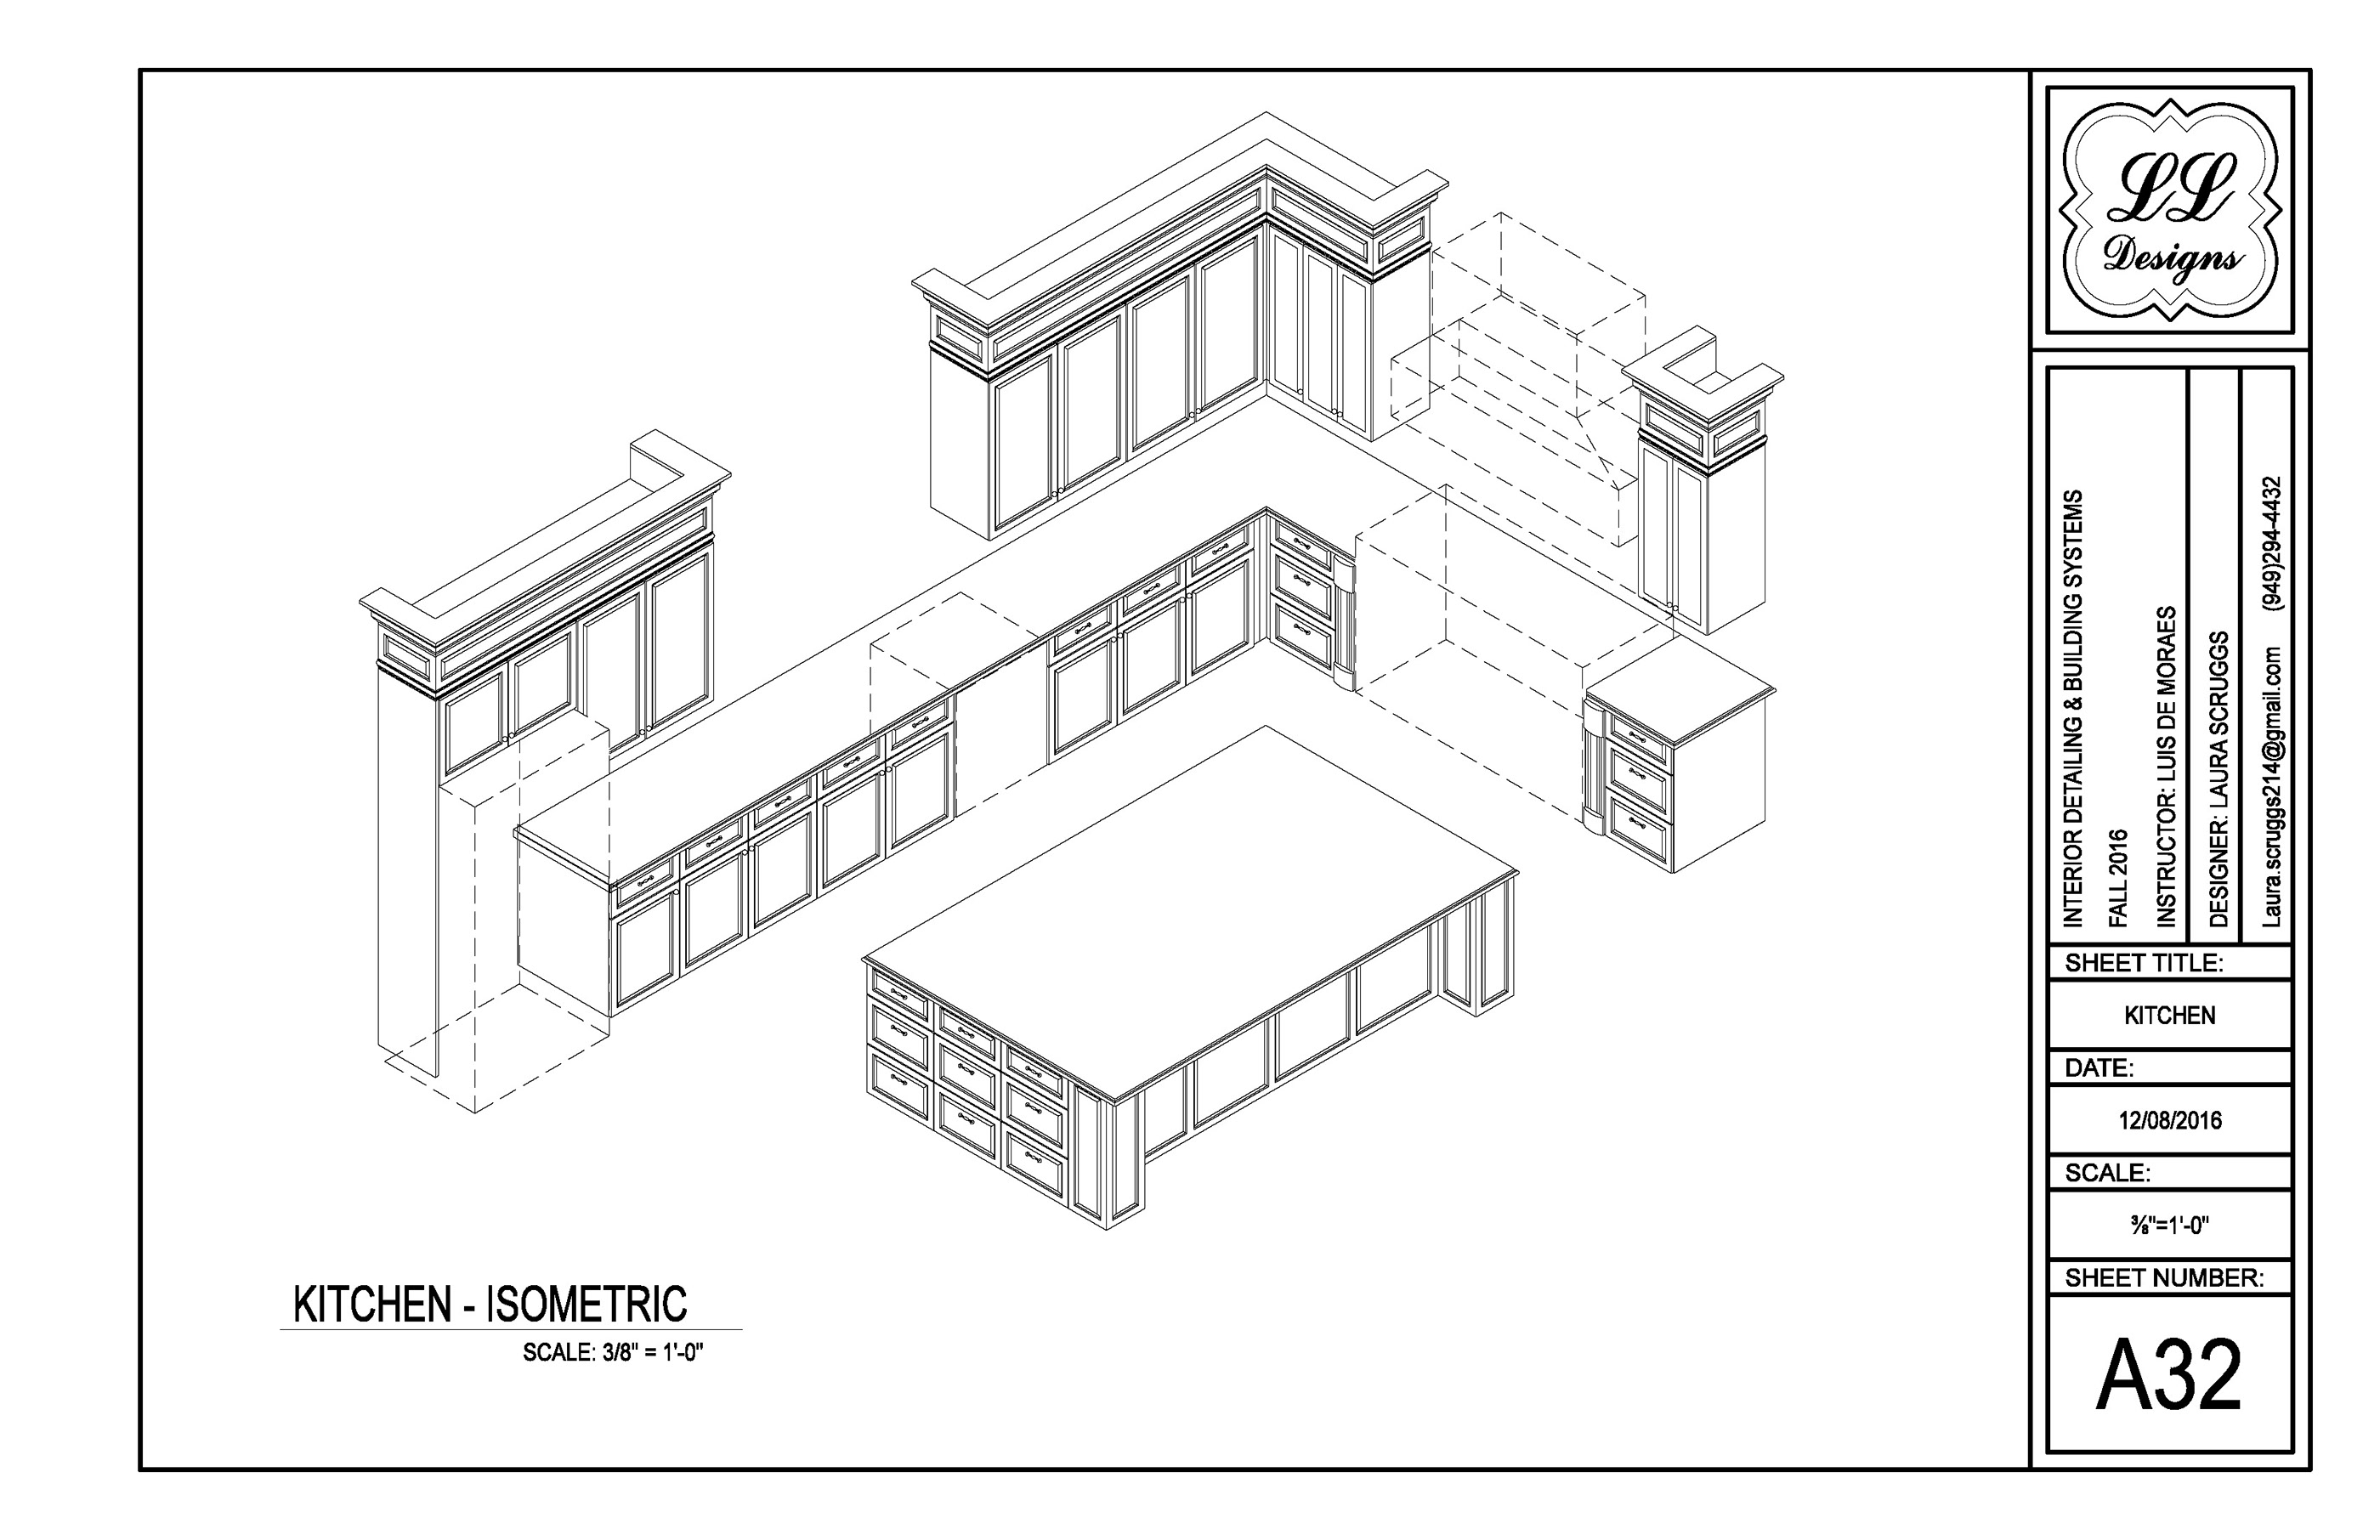 miller wiring diagram 230v p350